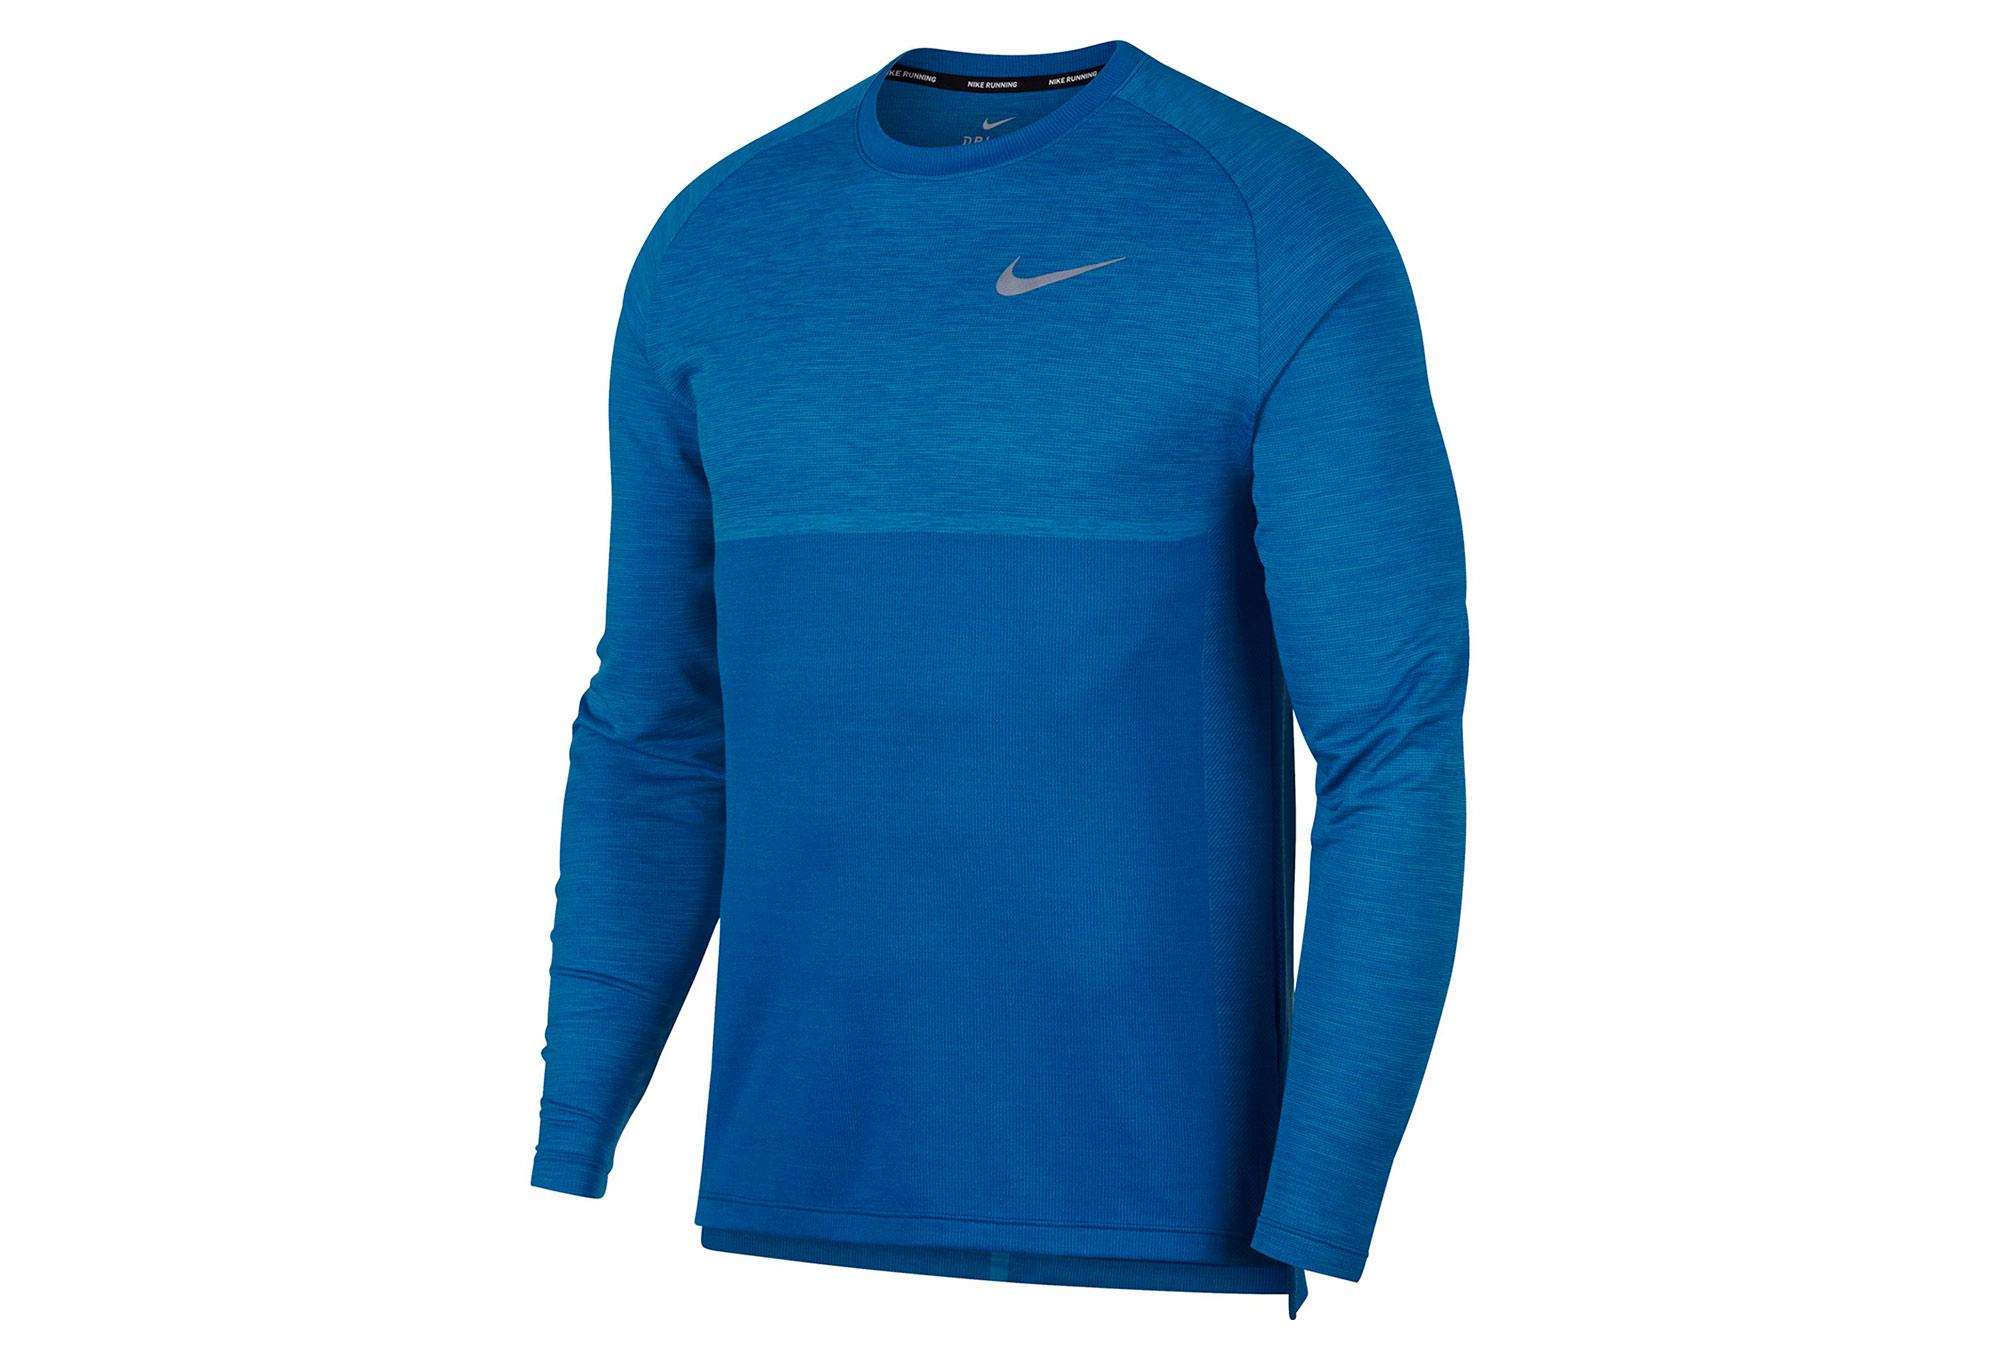 65deebd7 Nike Long Sleeves Jersey Dry Medalist Blue Men   Alltricks.com